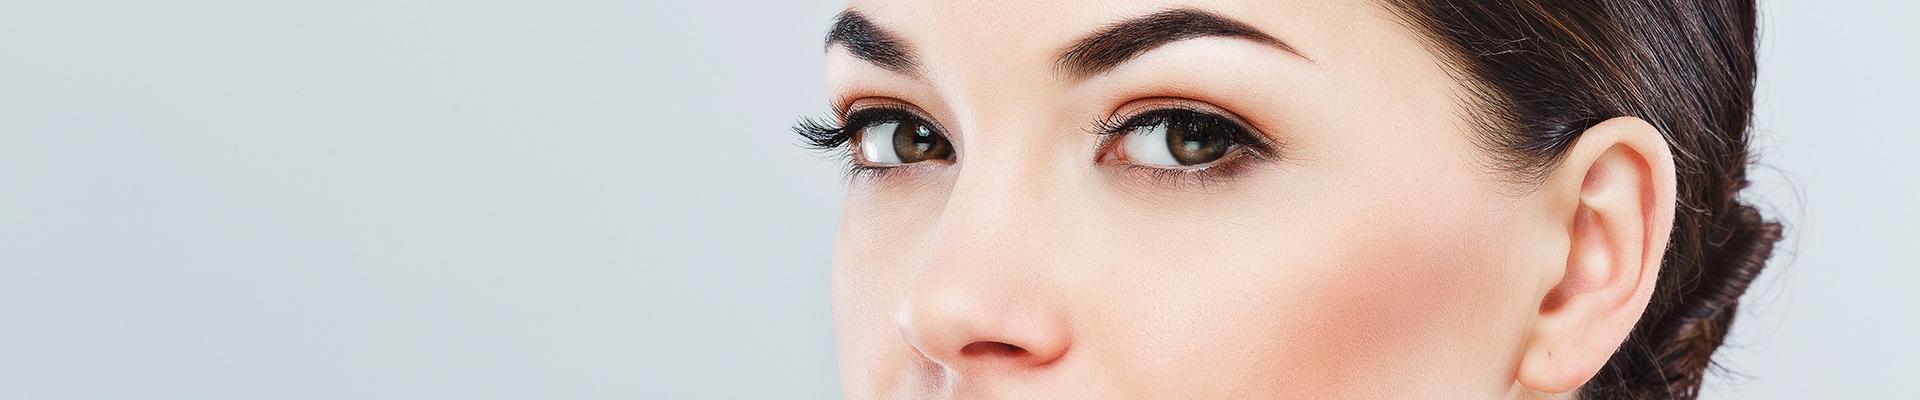 Blepharoplasty Denver | Eyelid Lift Lone Tree | Eyelid